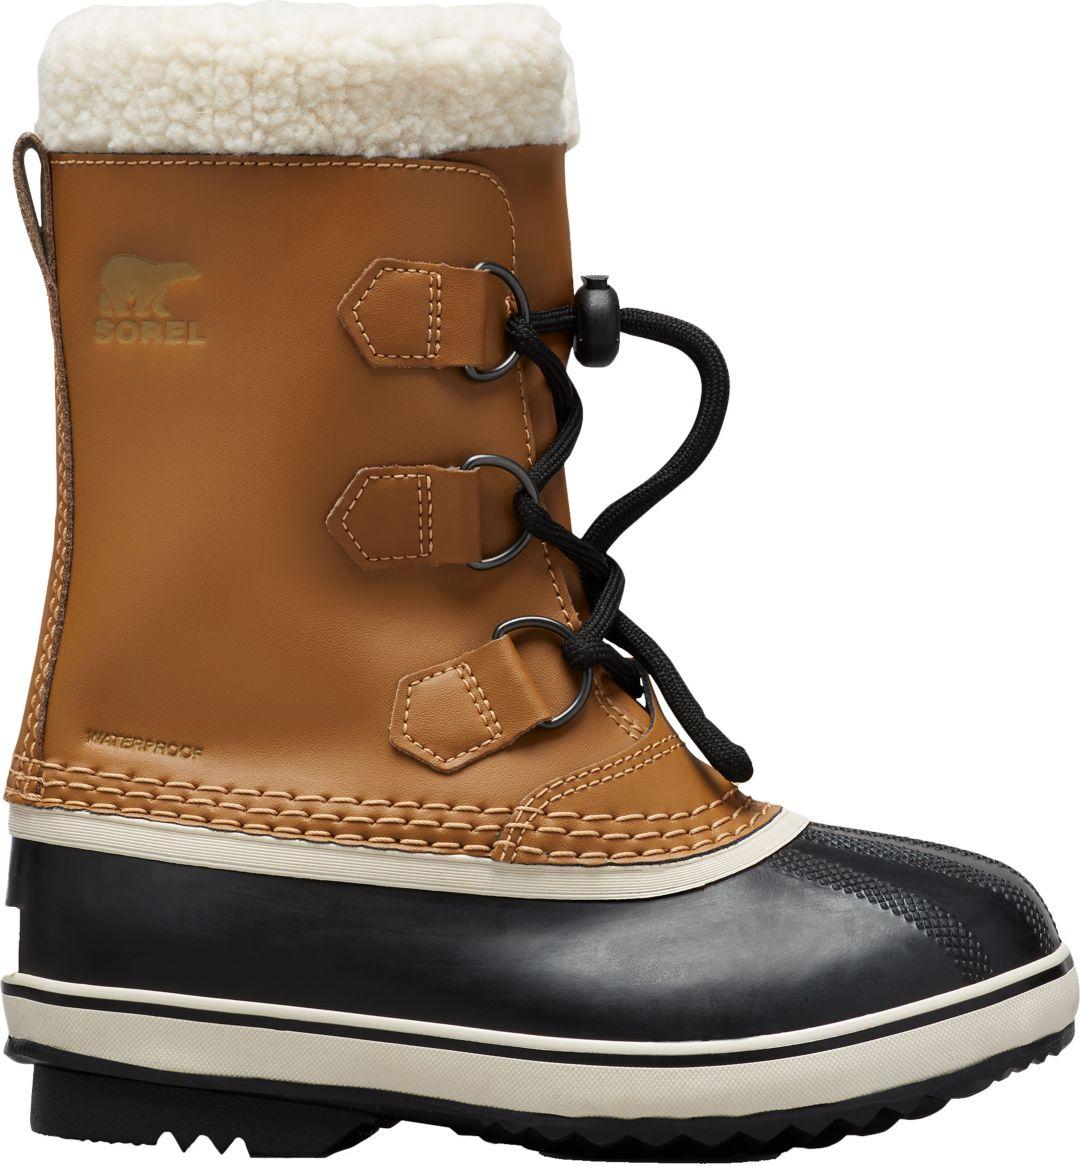 SOREL Kids' Yoot Pac TP Insulated Waterproof Winter Boots